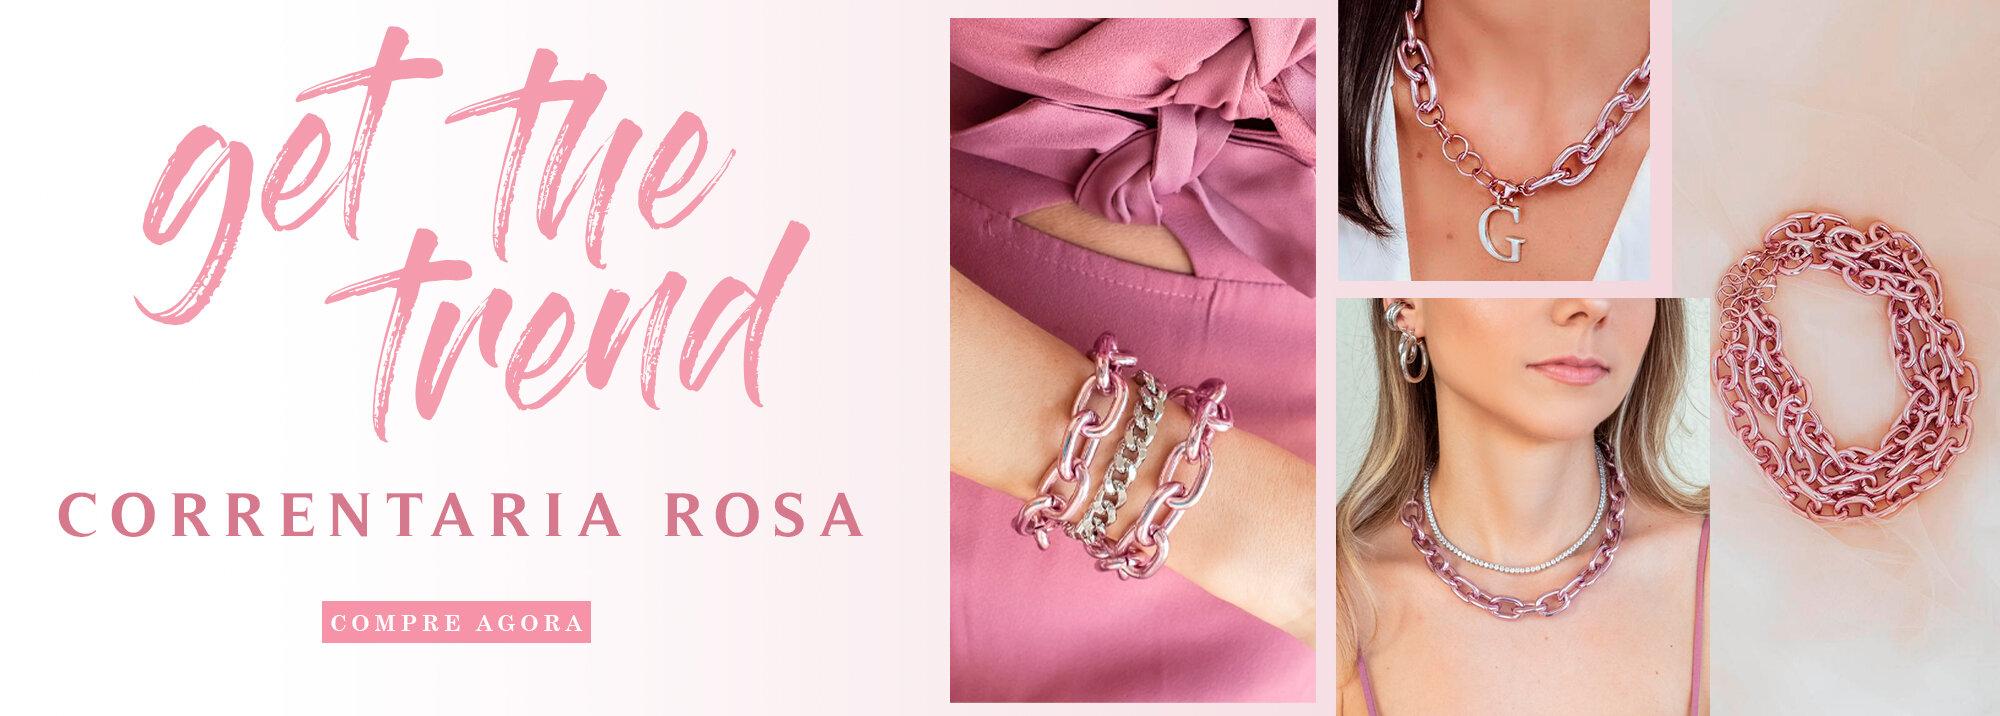 Correntaria Rosa